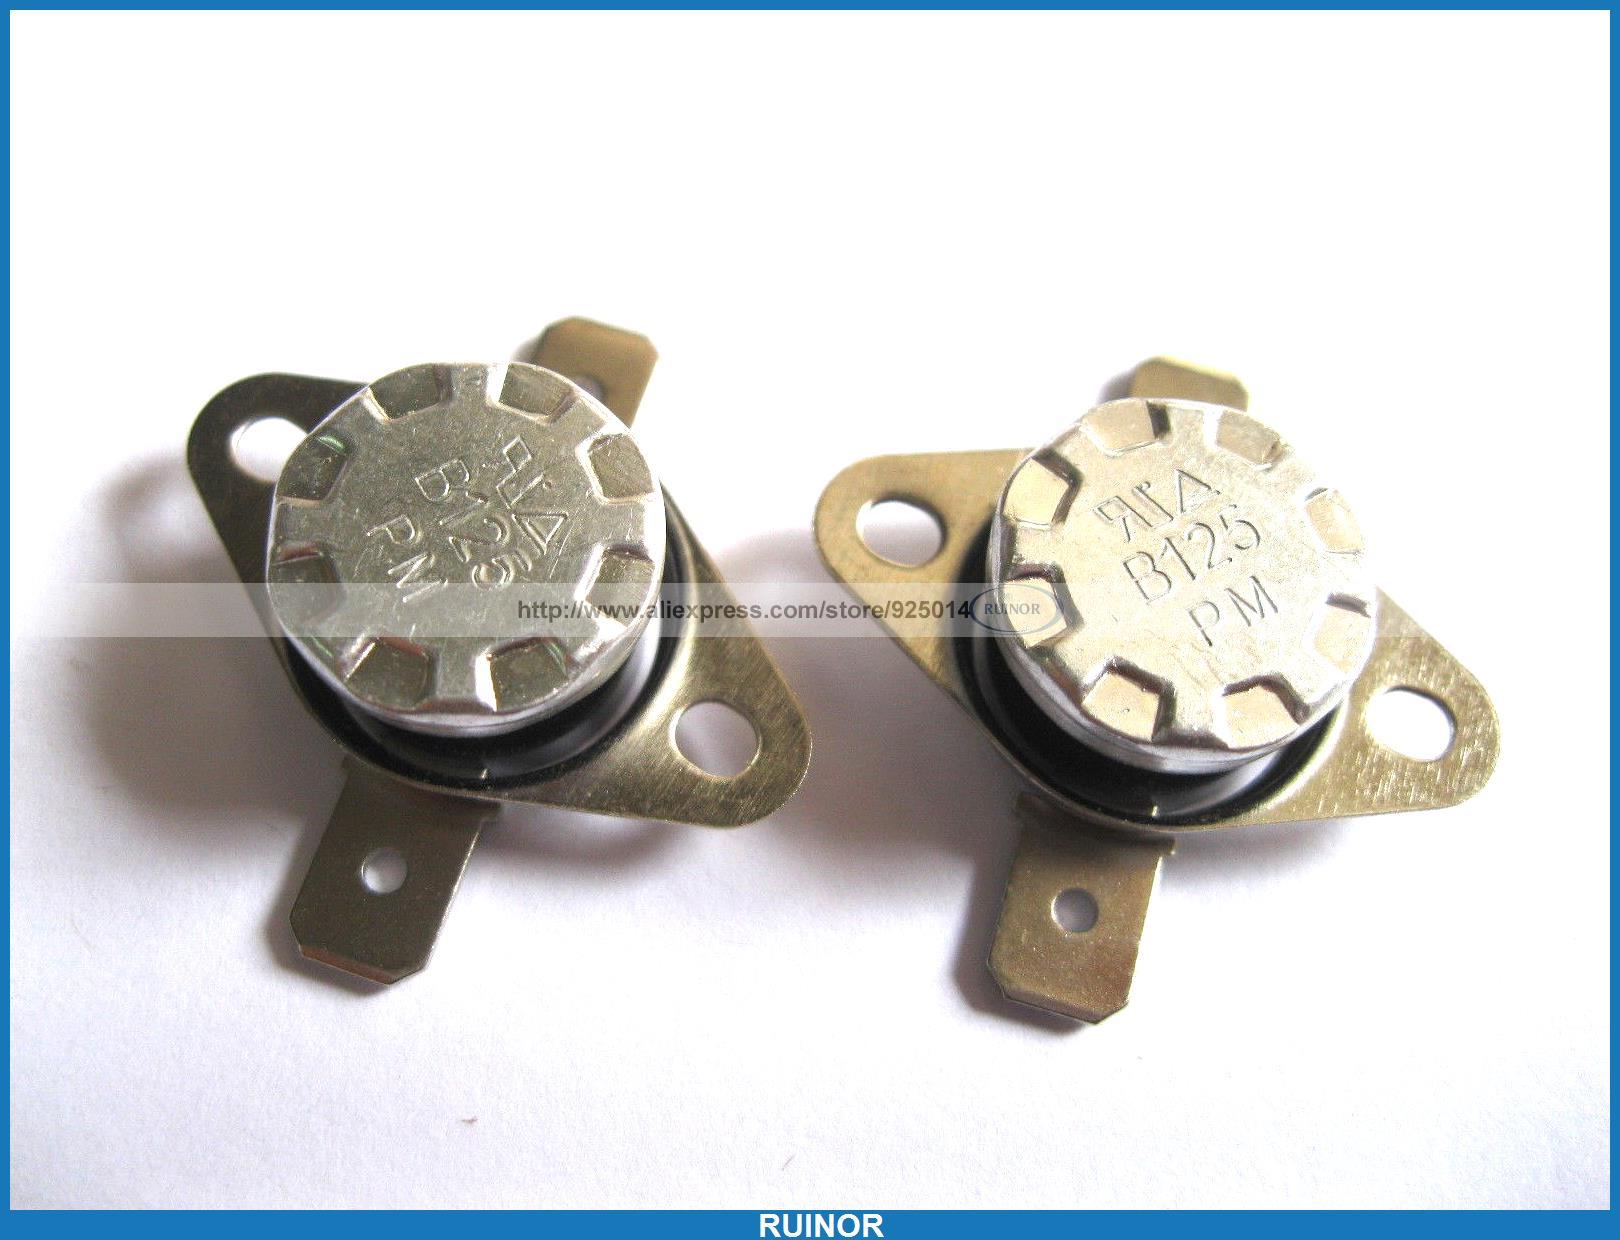 50 Pcs Temperature Switch Thermostat 125Degree N C KSD301